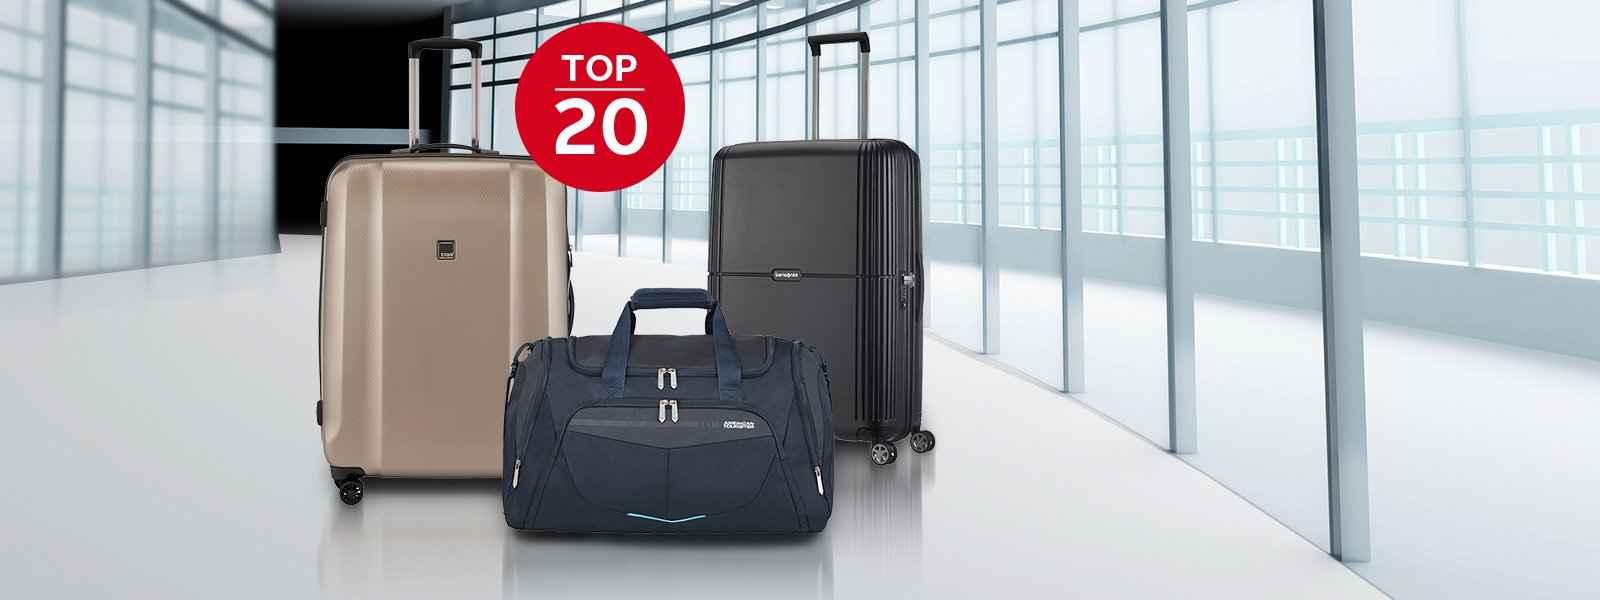 Top 20 Reisegepäck